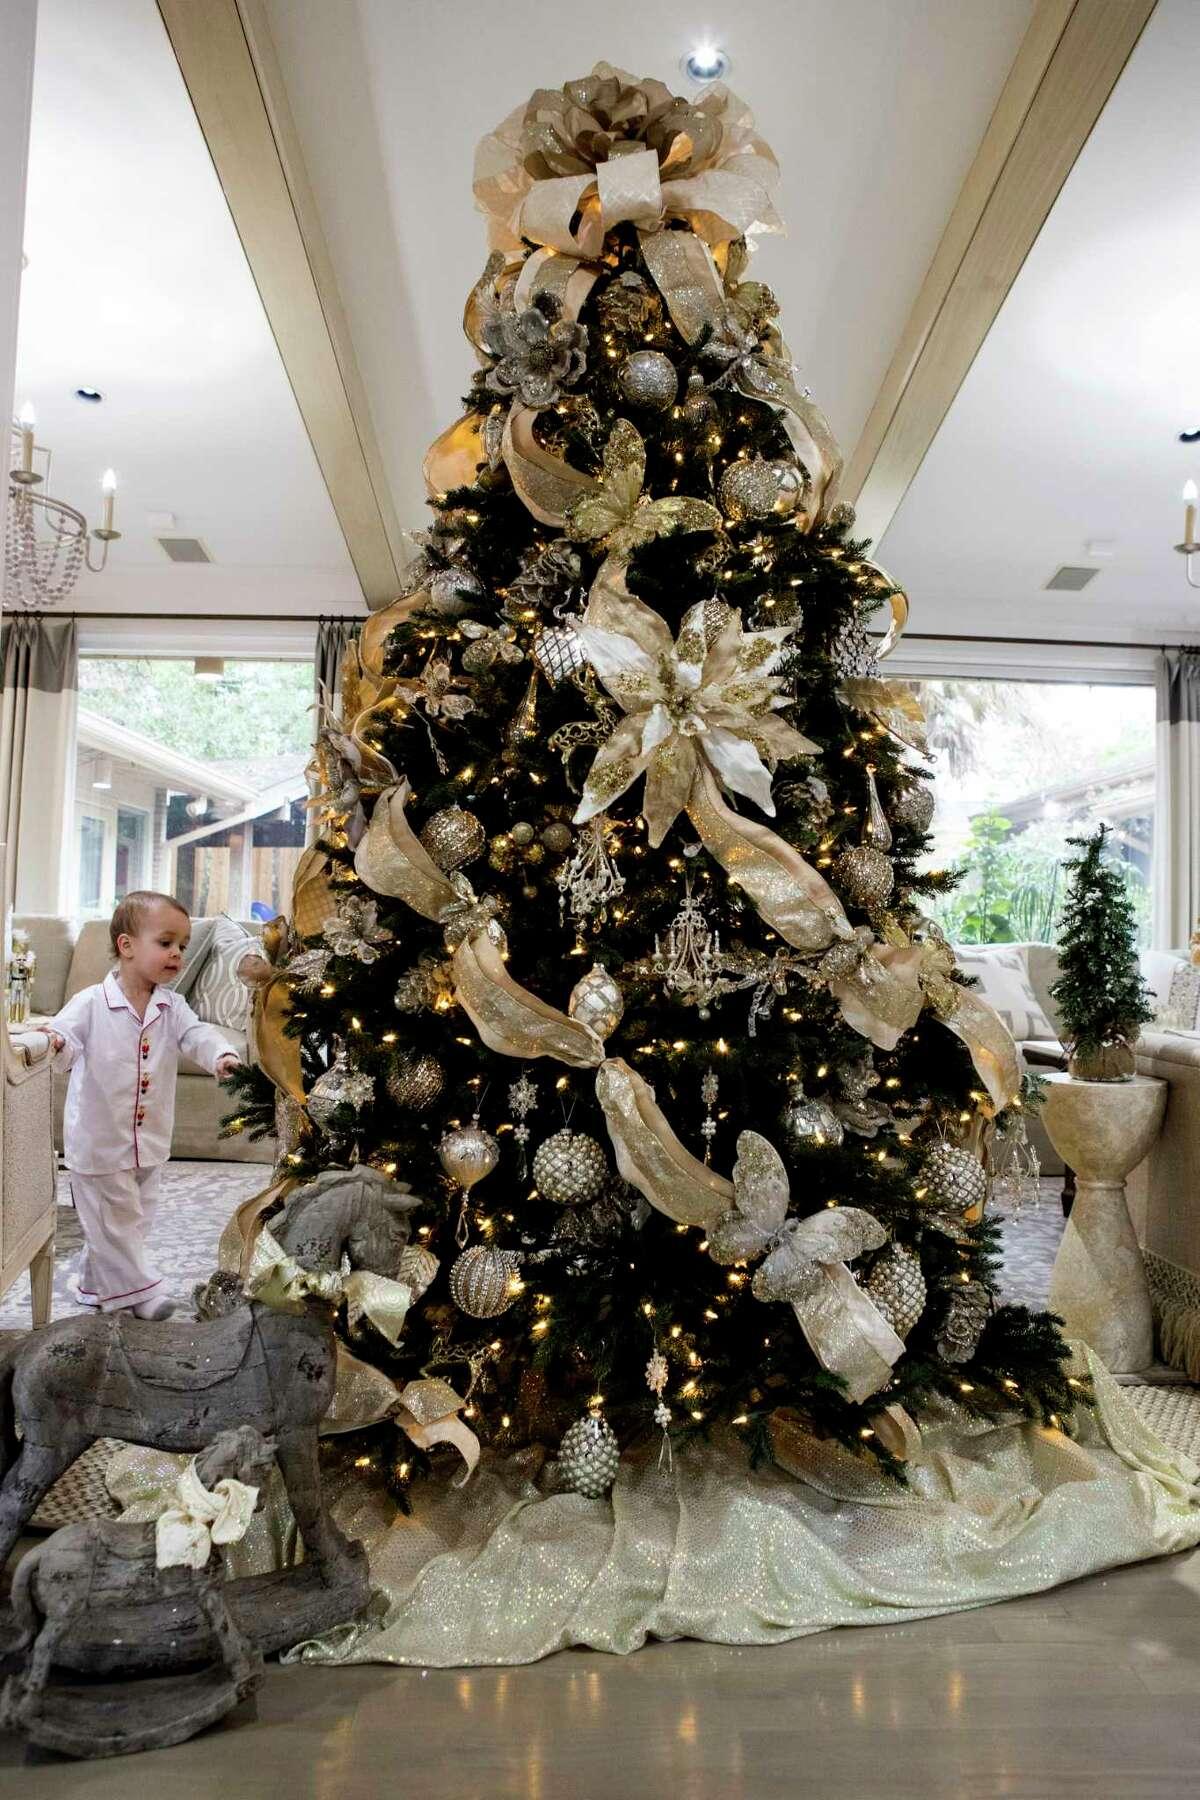 Grant Griffin walks past the family Christmas tree on Tuesday, Dec. 5, 2017, in Houston. ( Brett Coomer / Houston Chronicle )